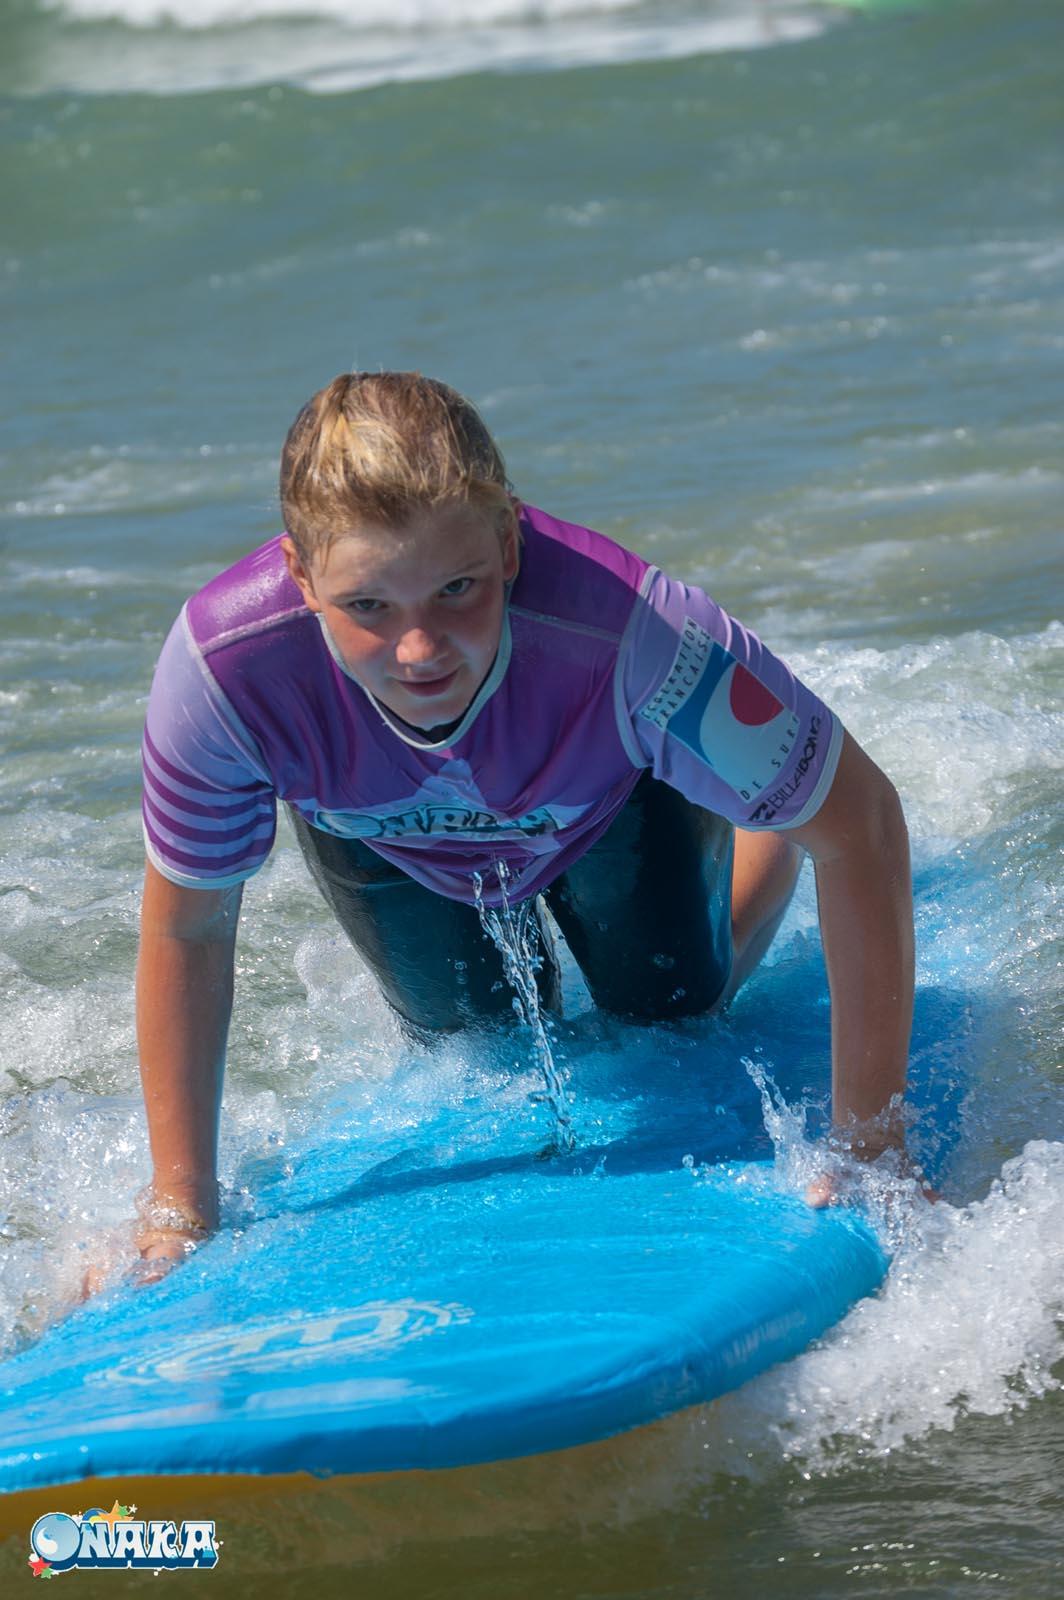 Cours collectif surf Onaka - Hendaye - 2 août 2018